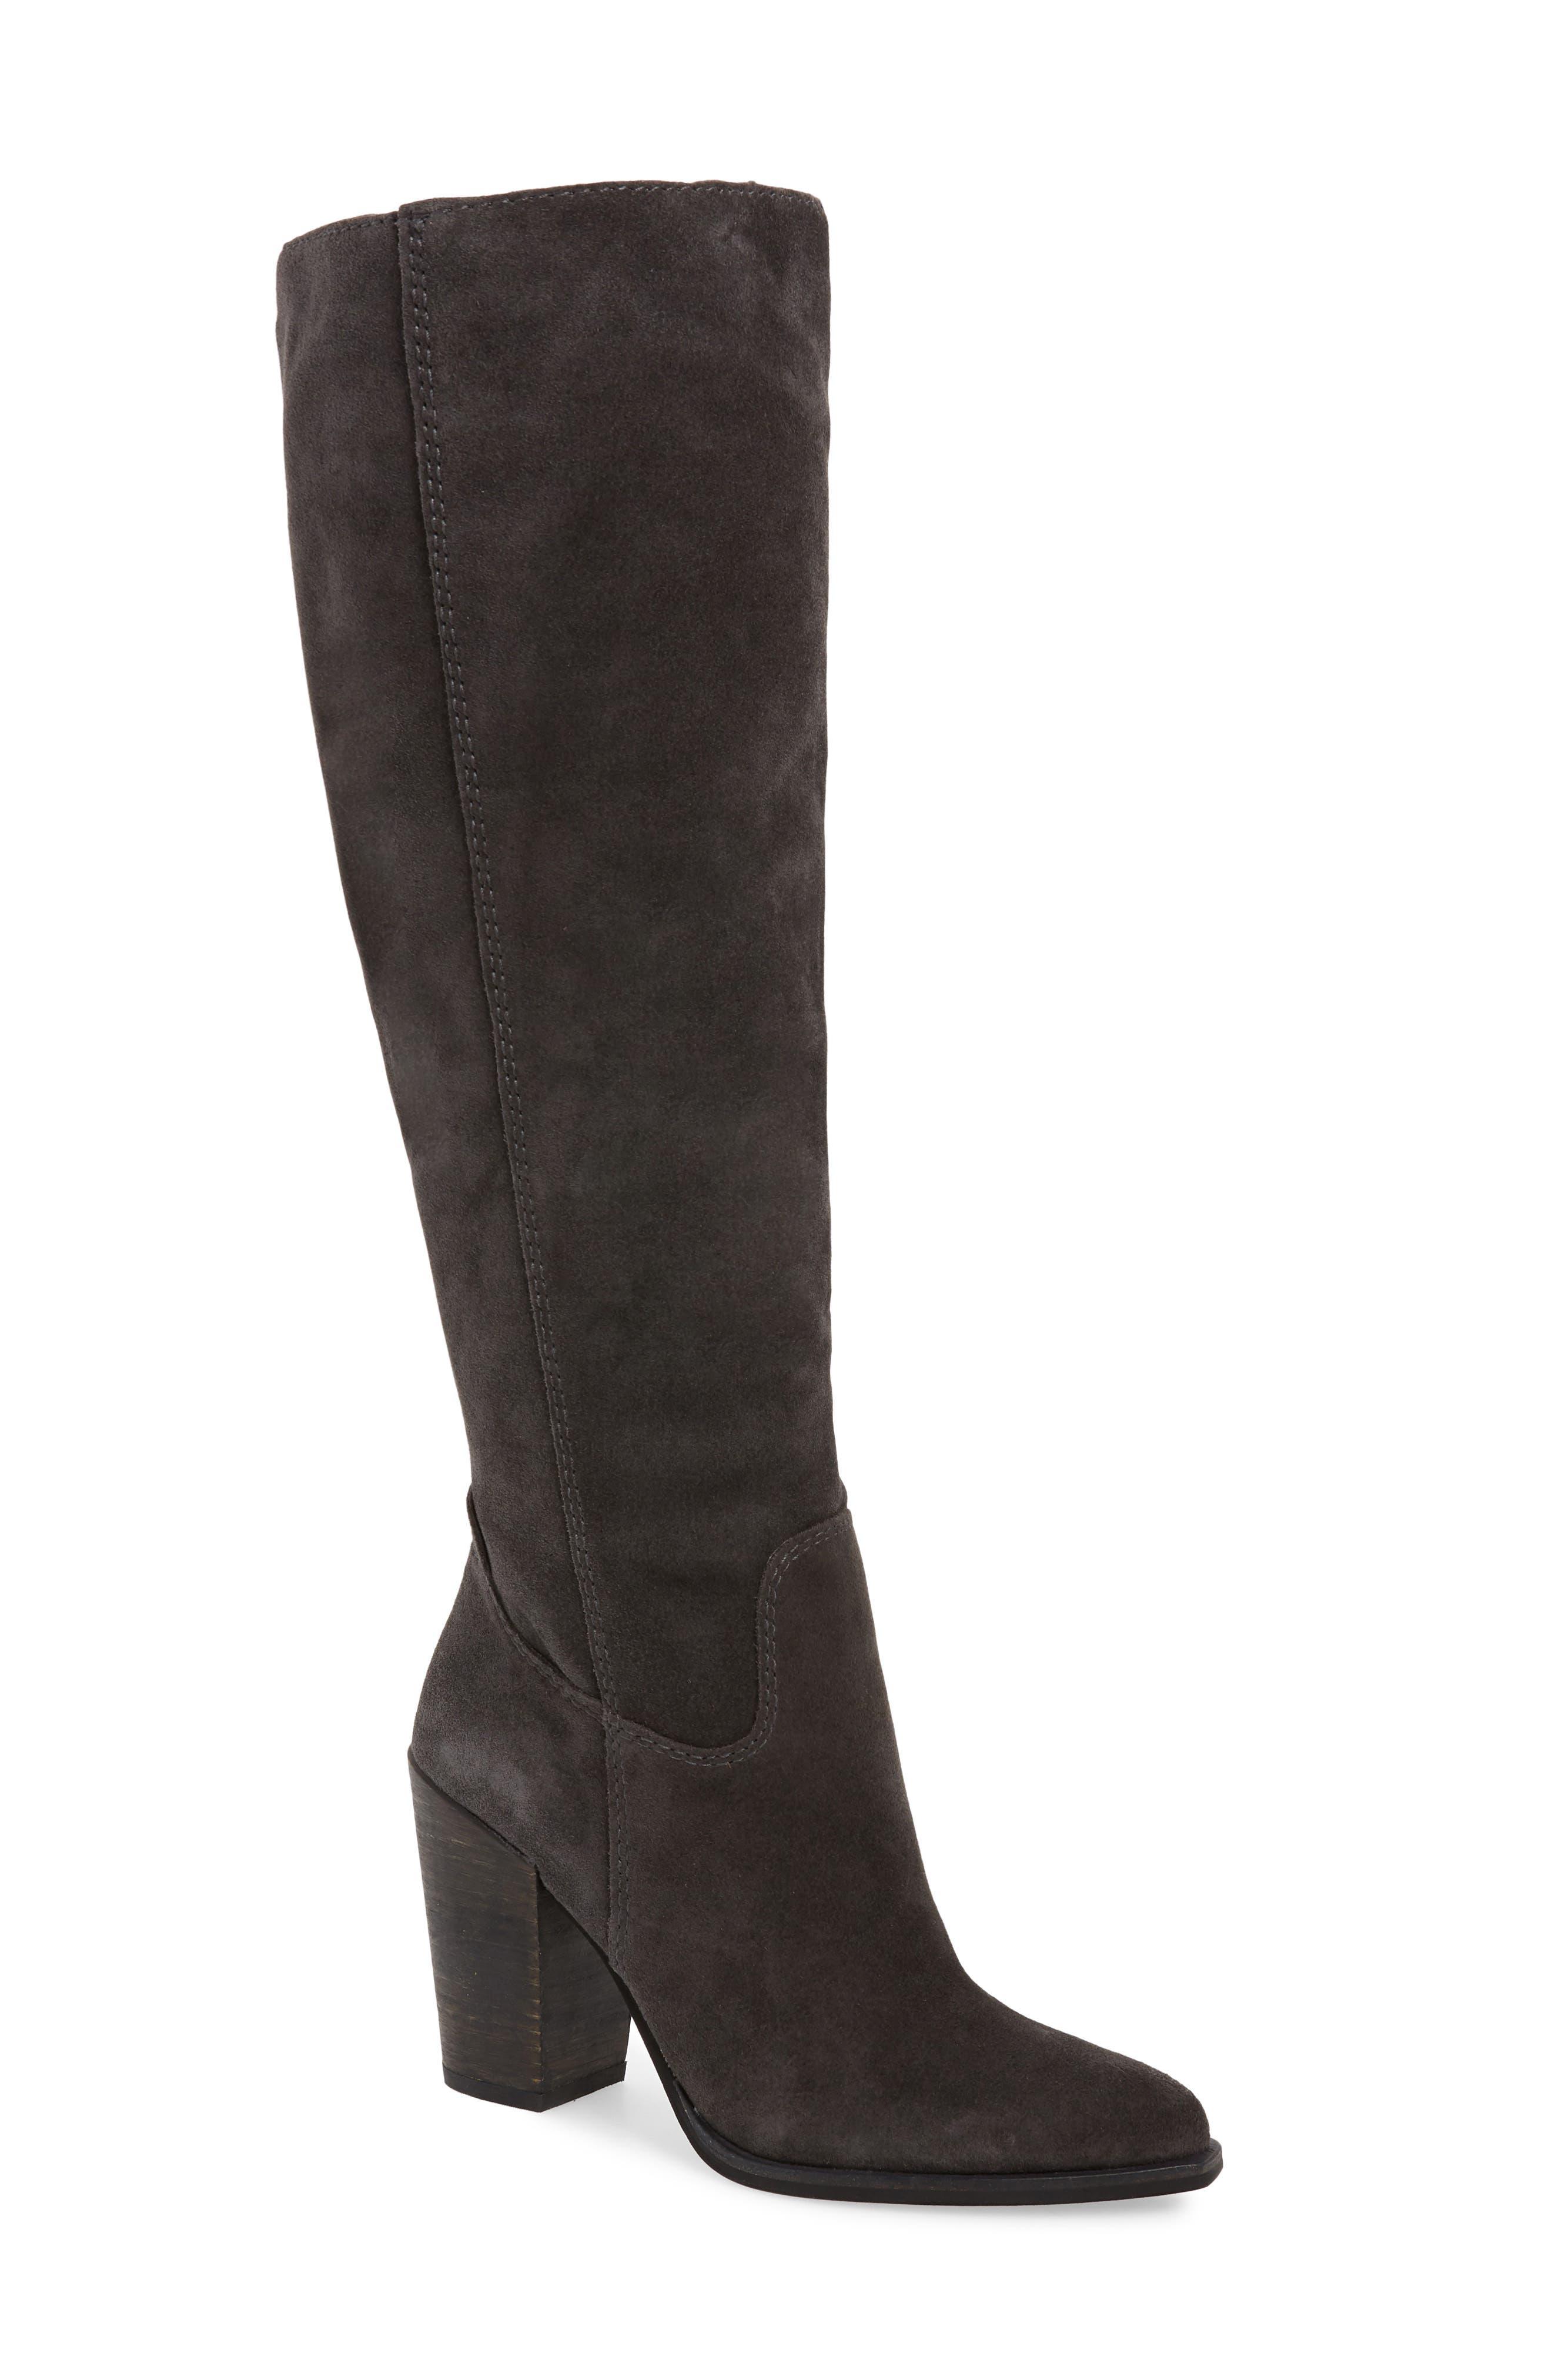 Dolce Vita Kylar Knee High Boot, Grey